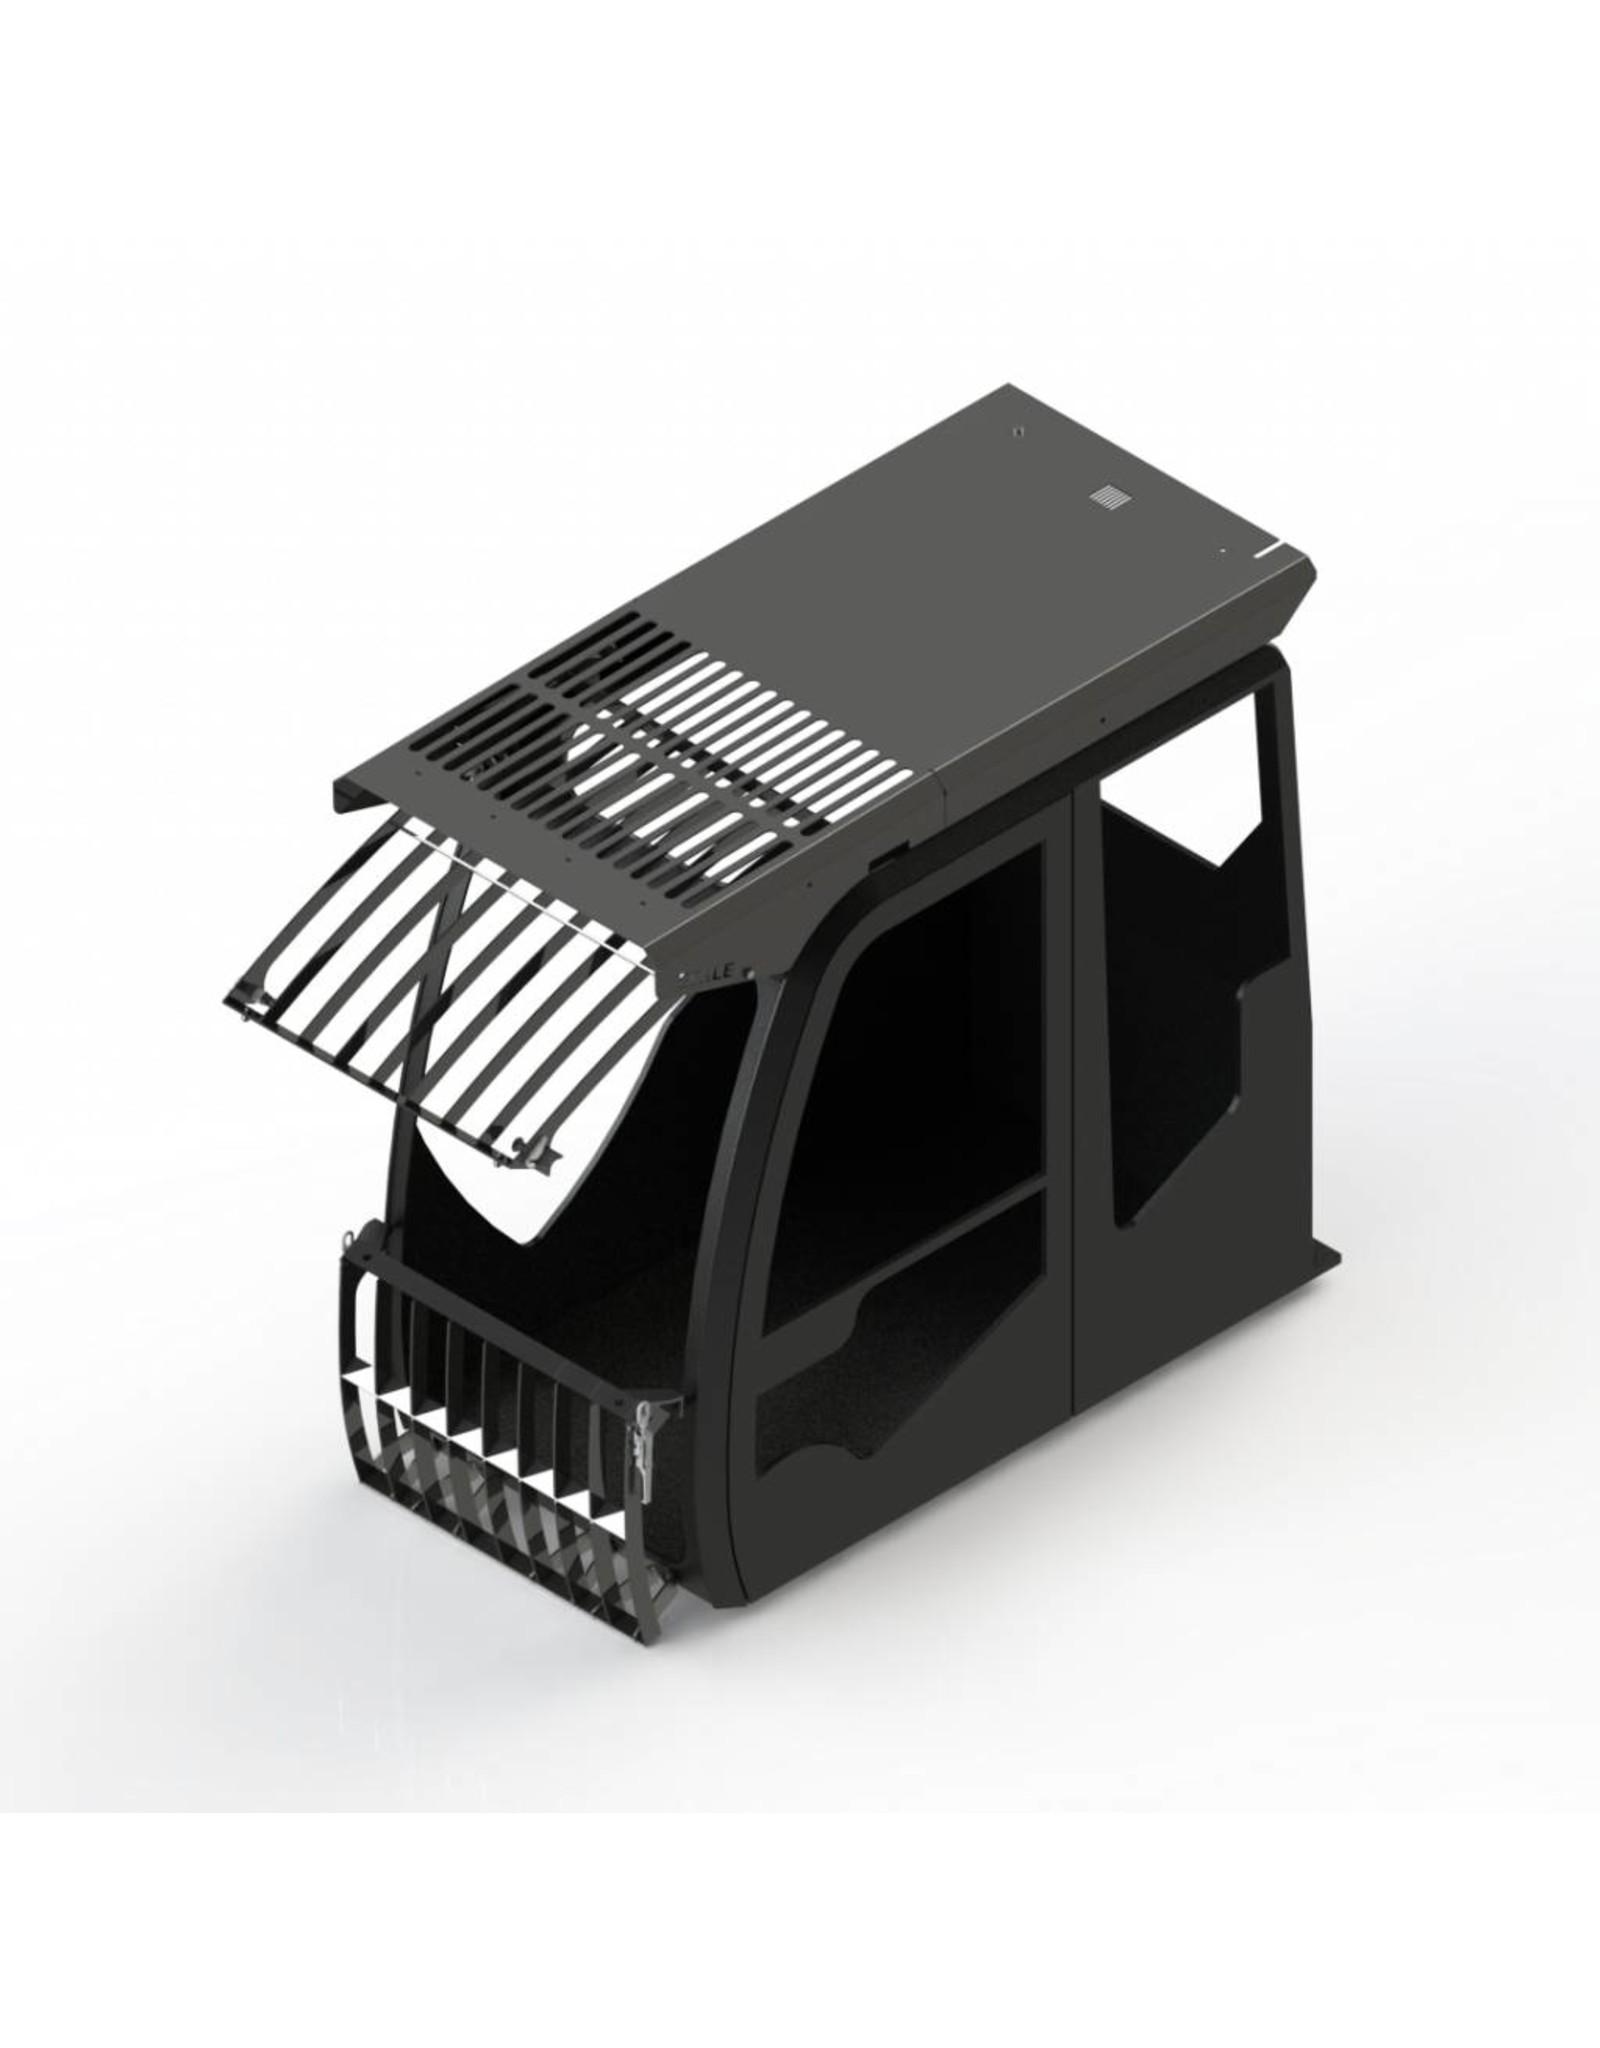 Echle Hartstahl GmbH FOPS for Liebherr A 918